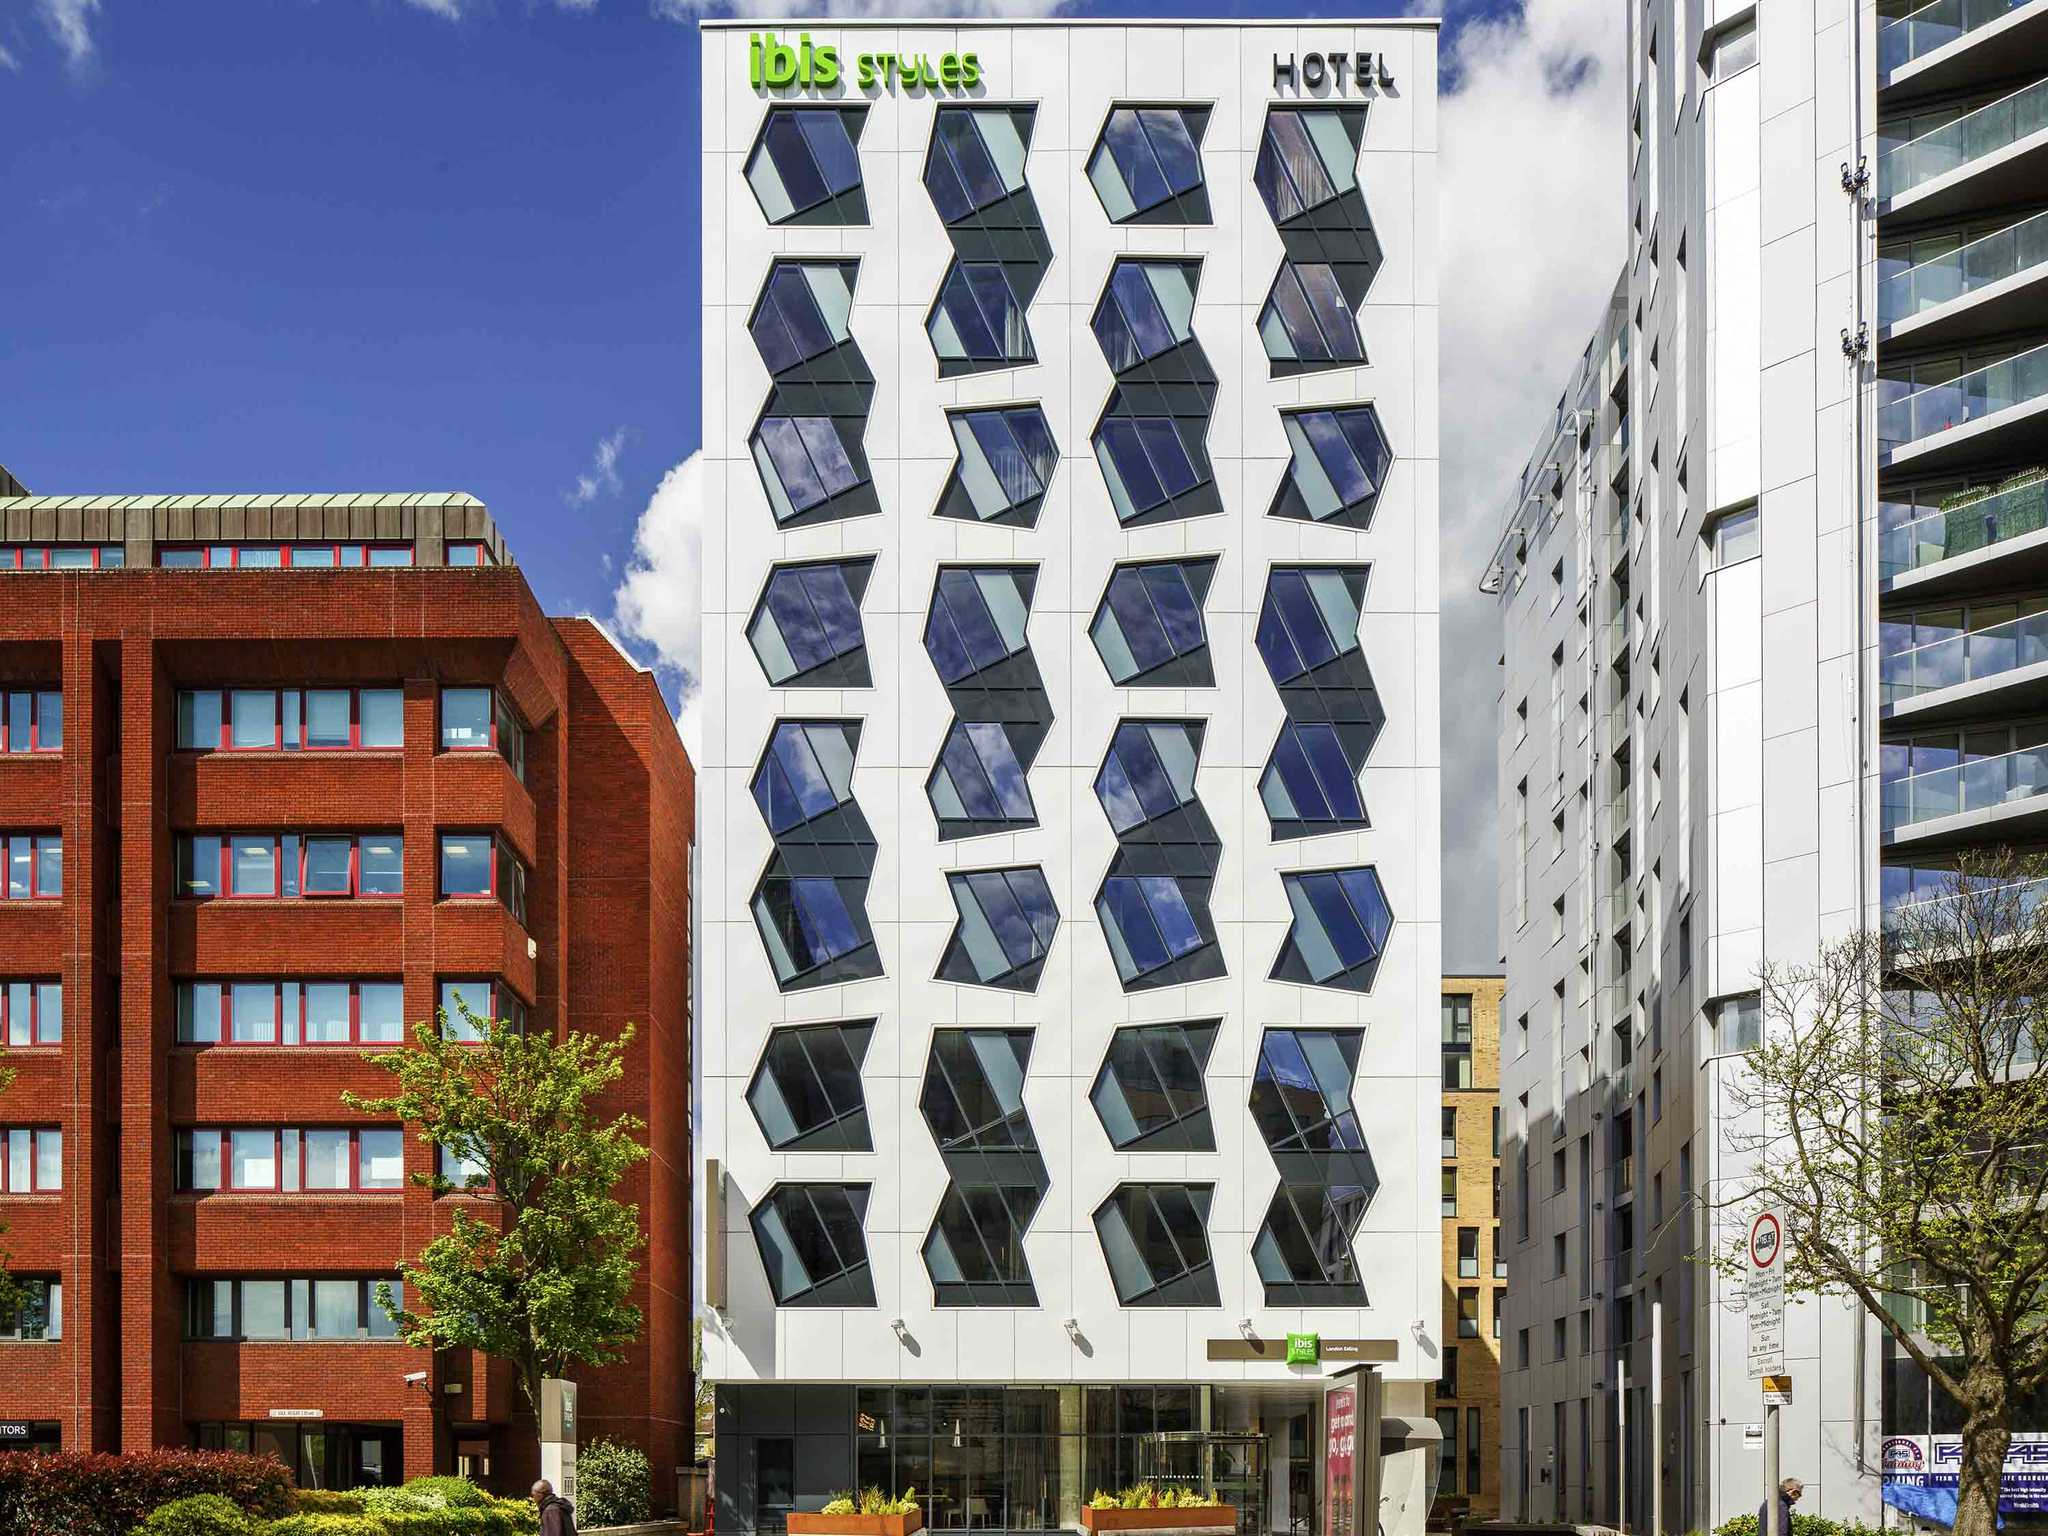 Hotel – ibis Styles London Ealing (ora aperto)